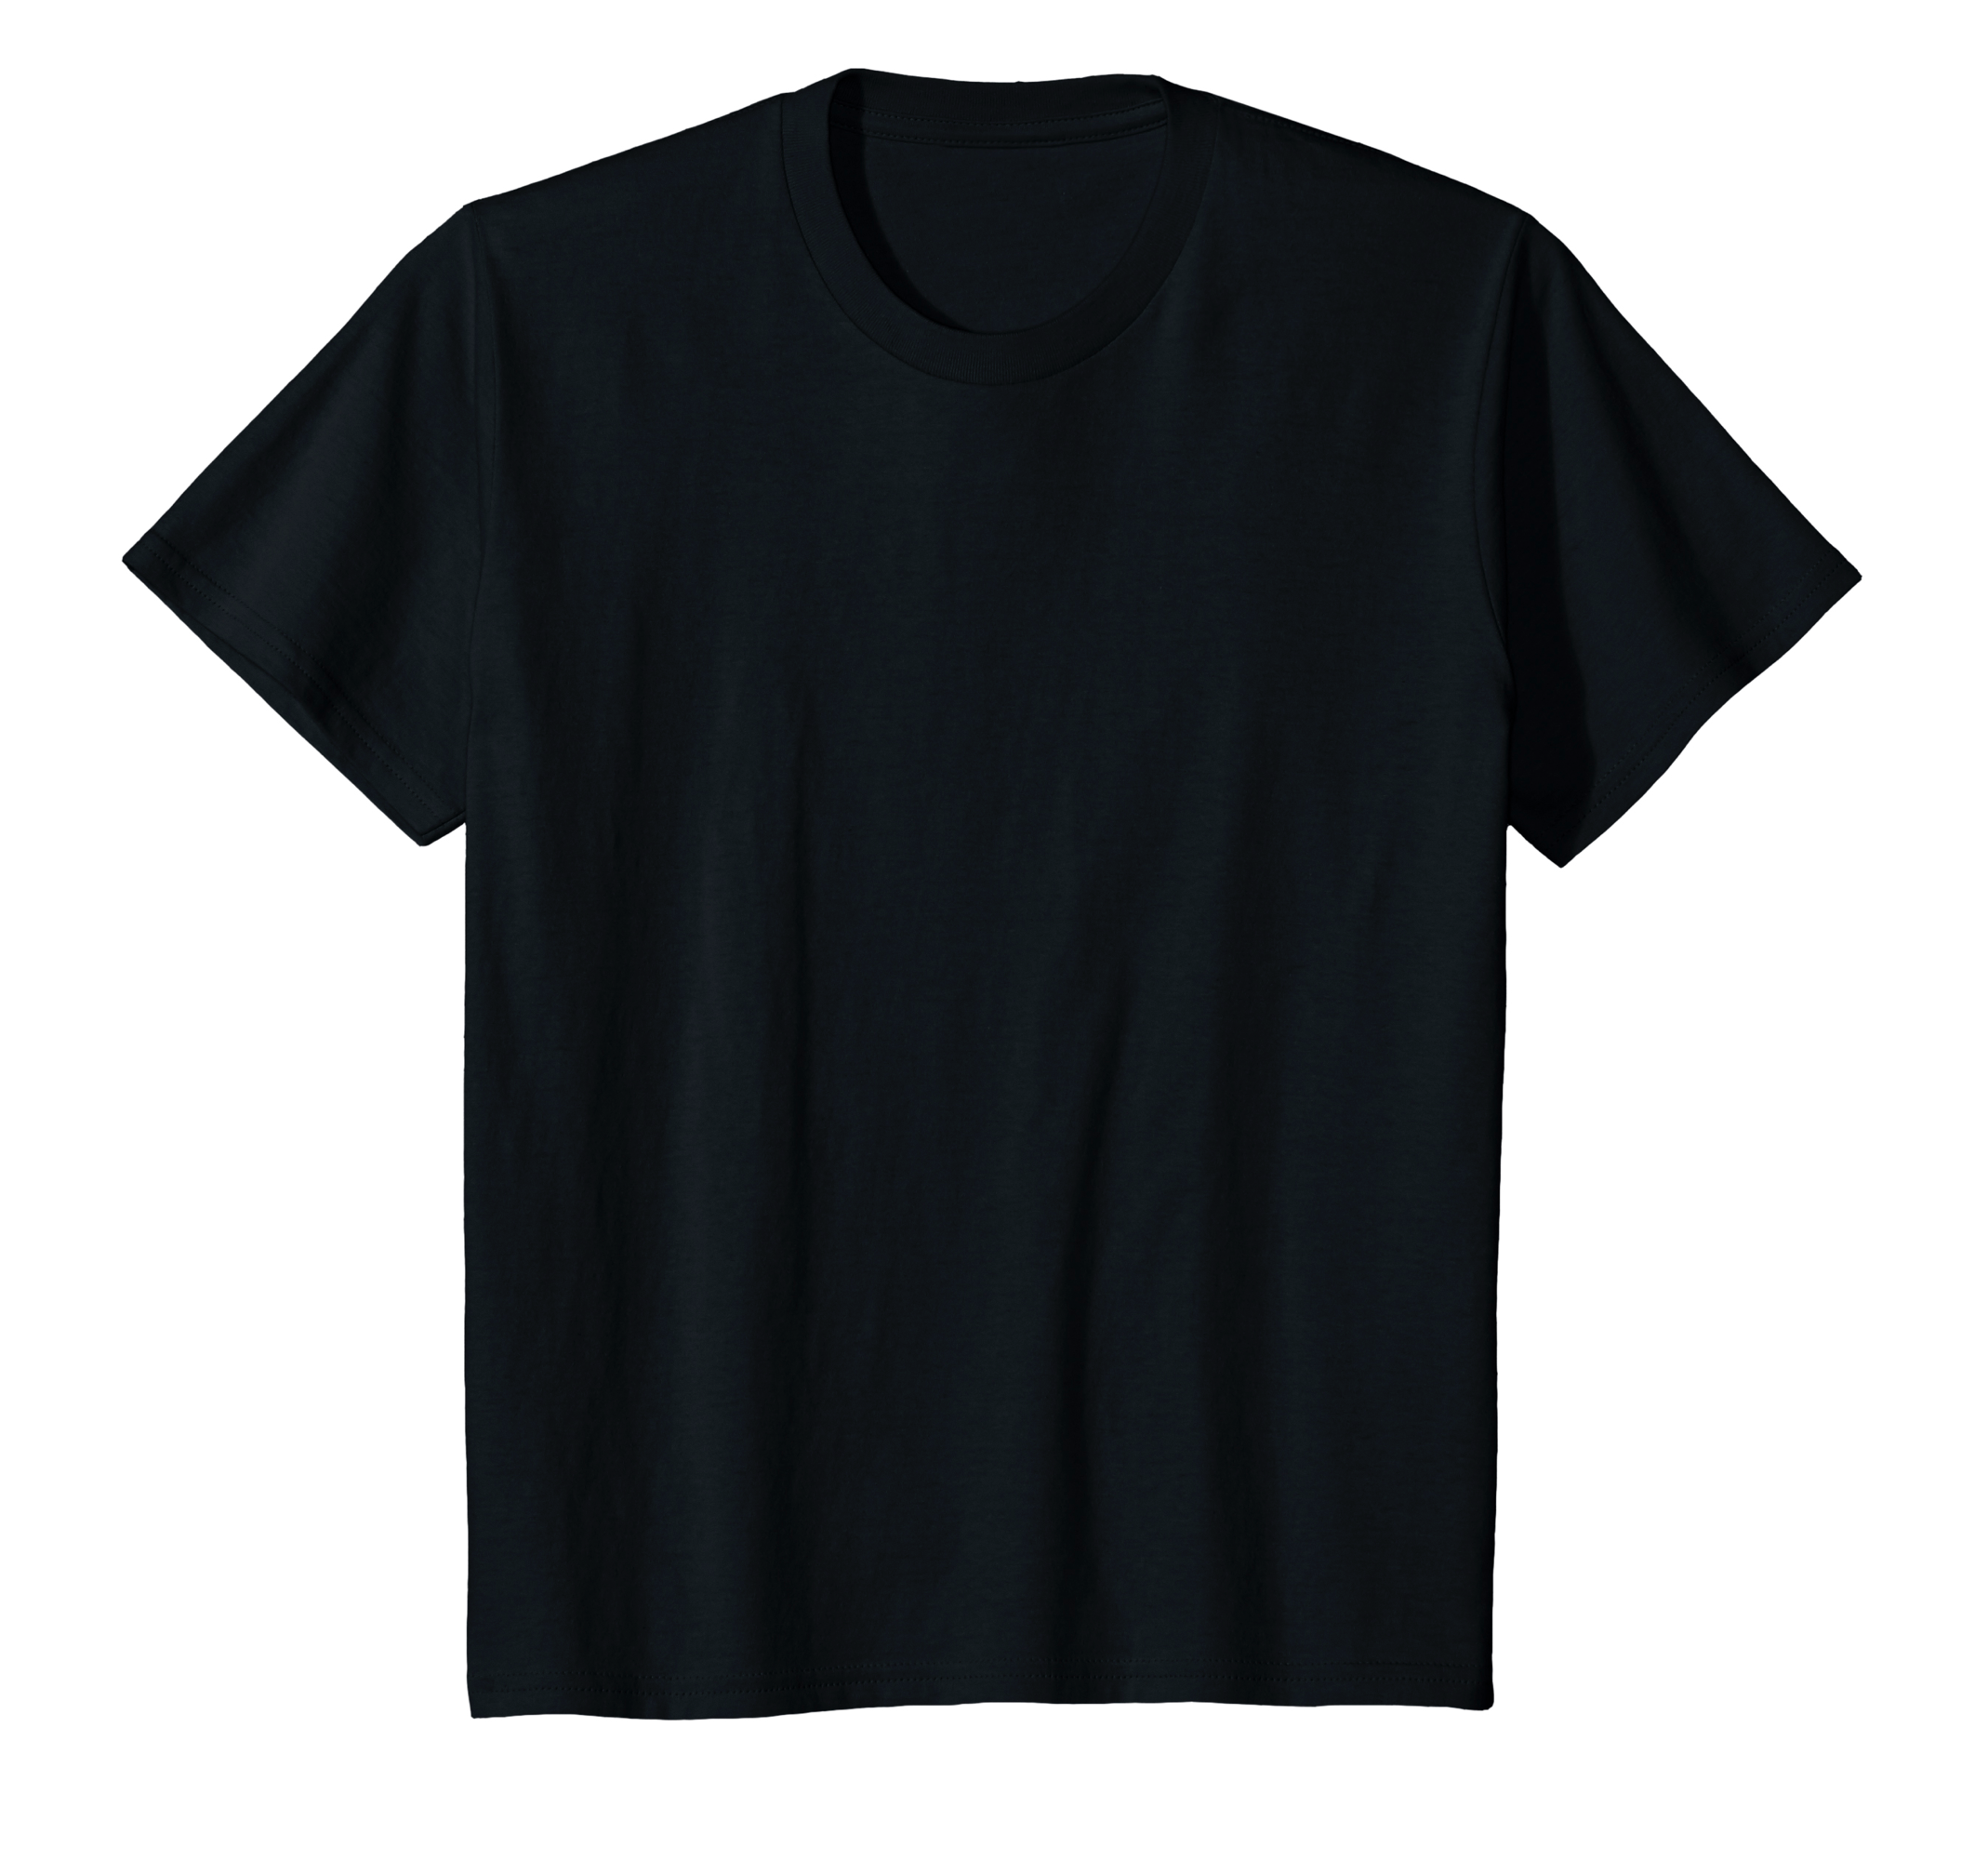 New Black Night Of The Living Dead Cult Horror Movie T-Shirt George Romero